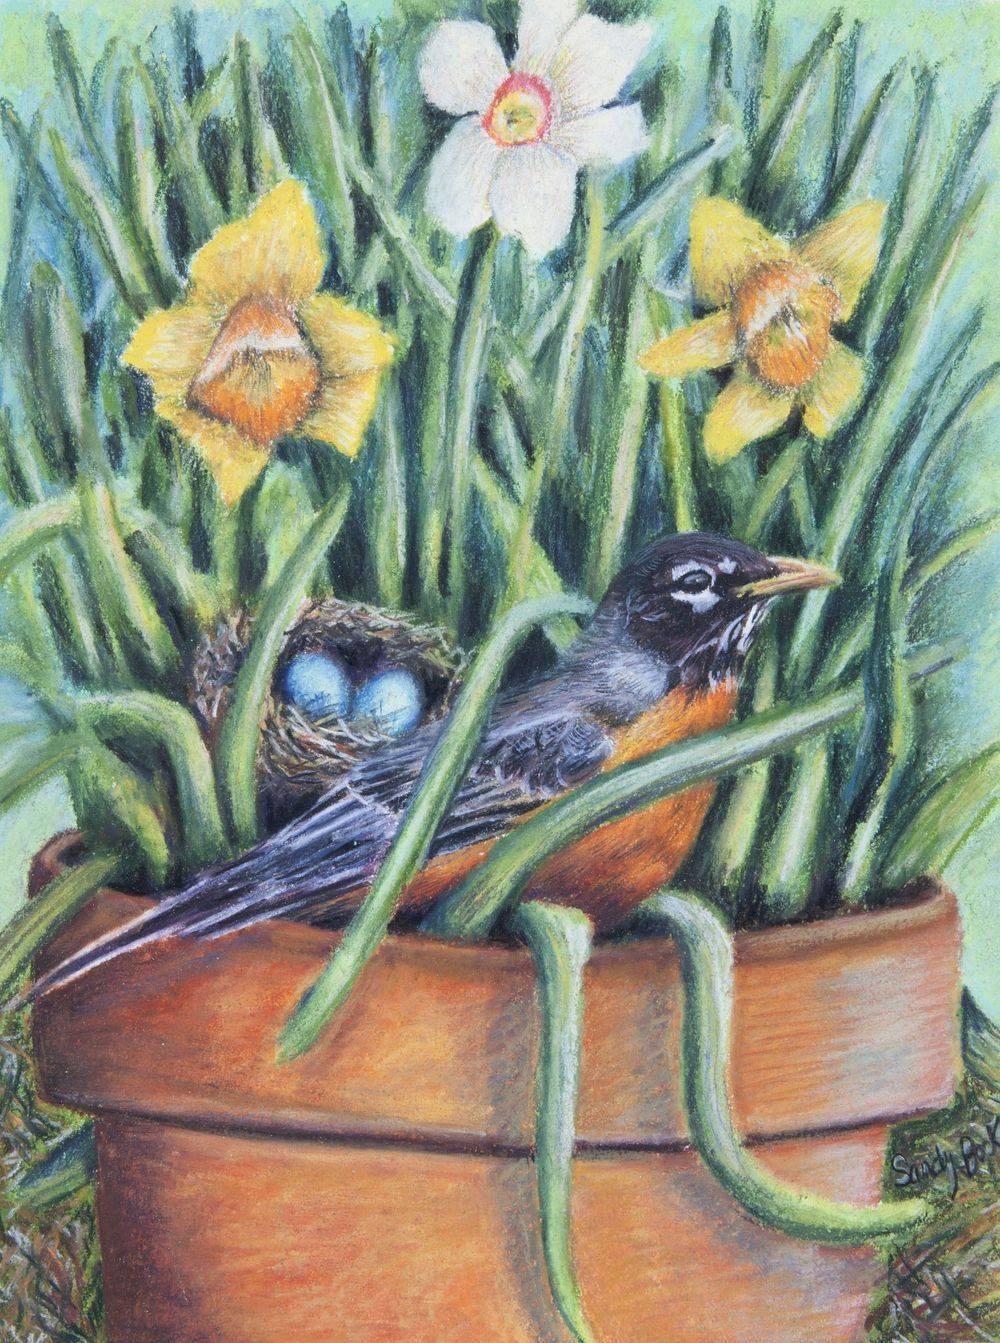 pastel illustration art, pastel illustration, custom art, ilustration artist, pastel artist, custom painting, freelance artist, spring, daffodils, robin, robin's eggs, bird nest